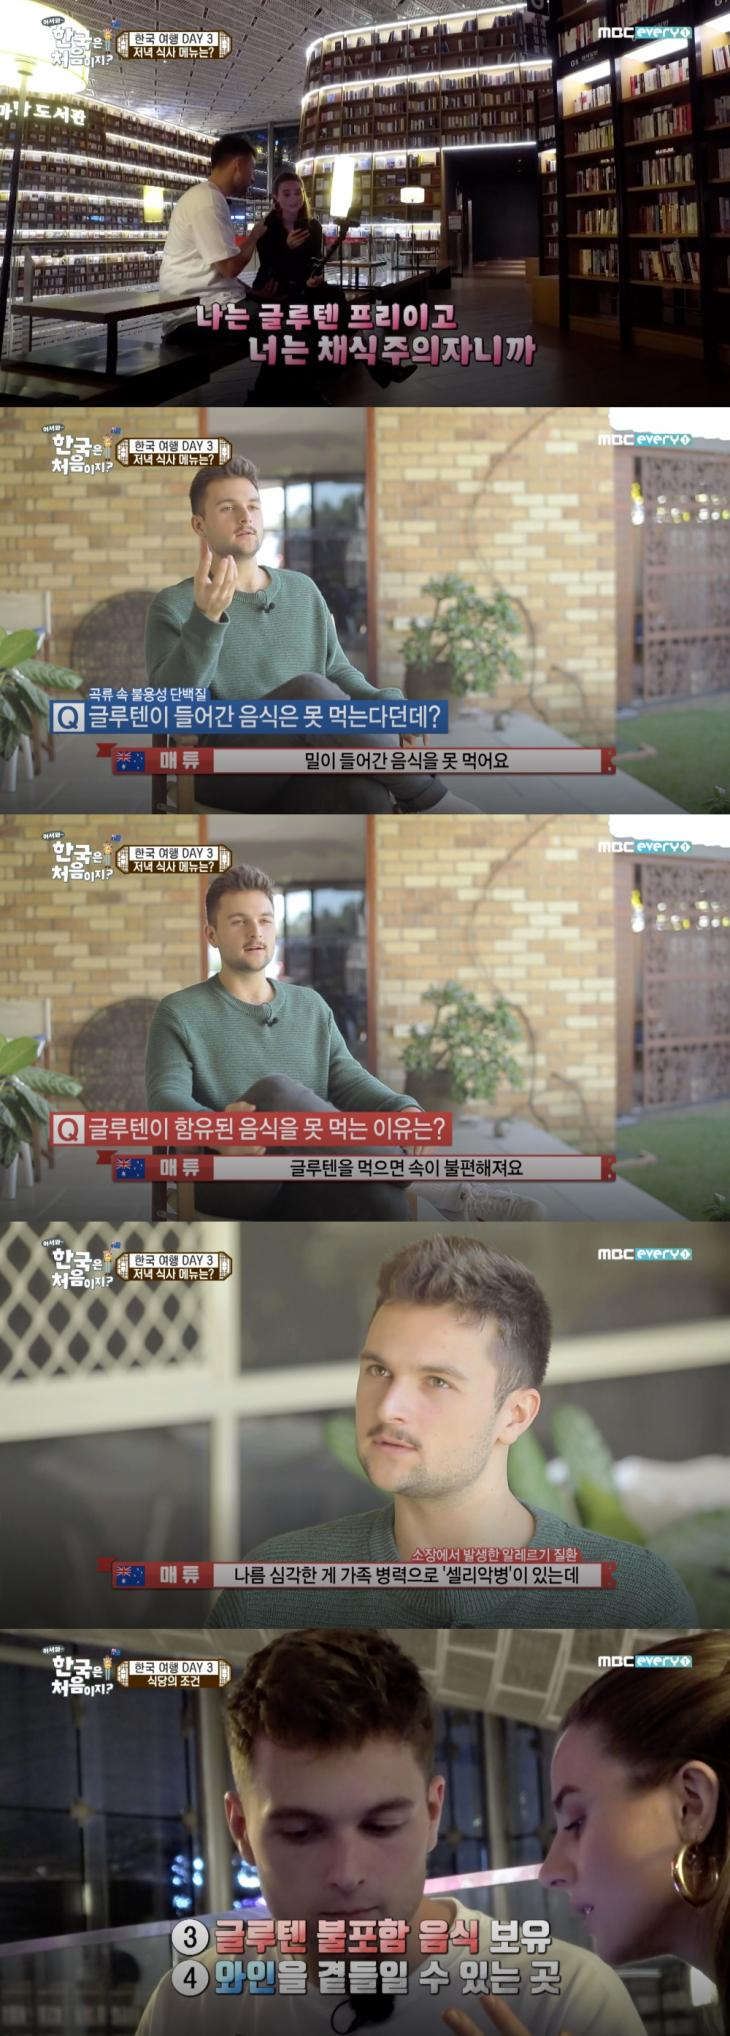 MBC 에브리원 '어서와 한국은 처음이지' 방송 캡처